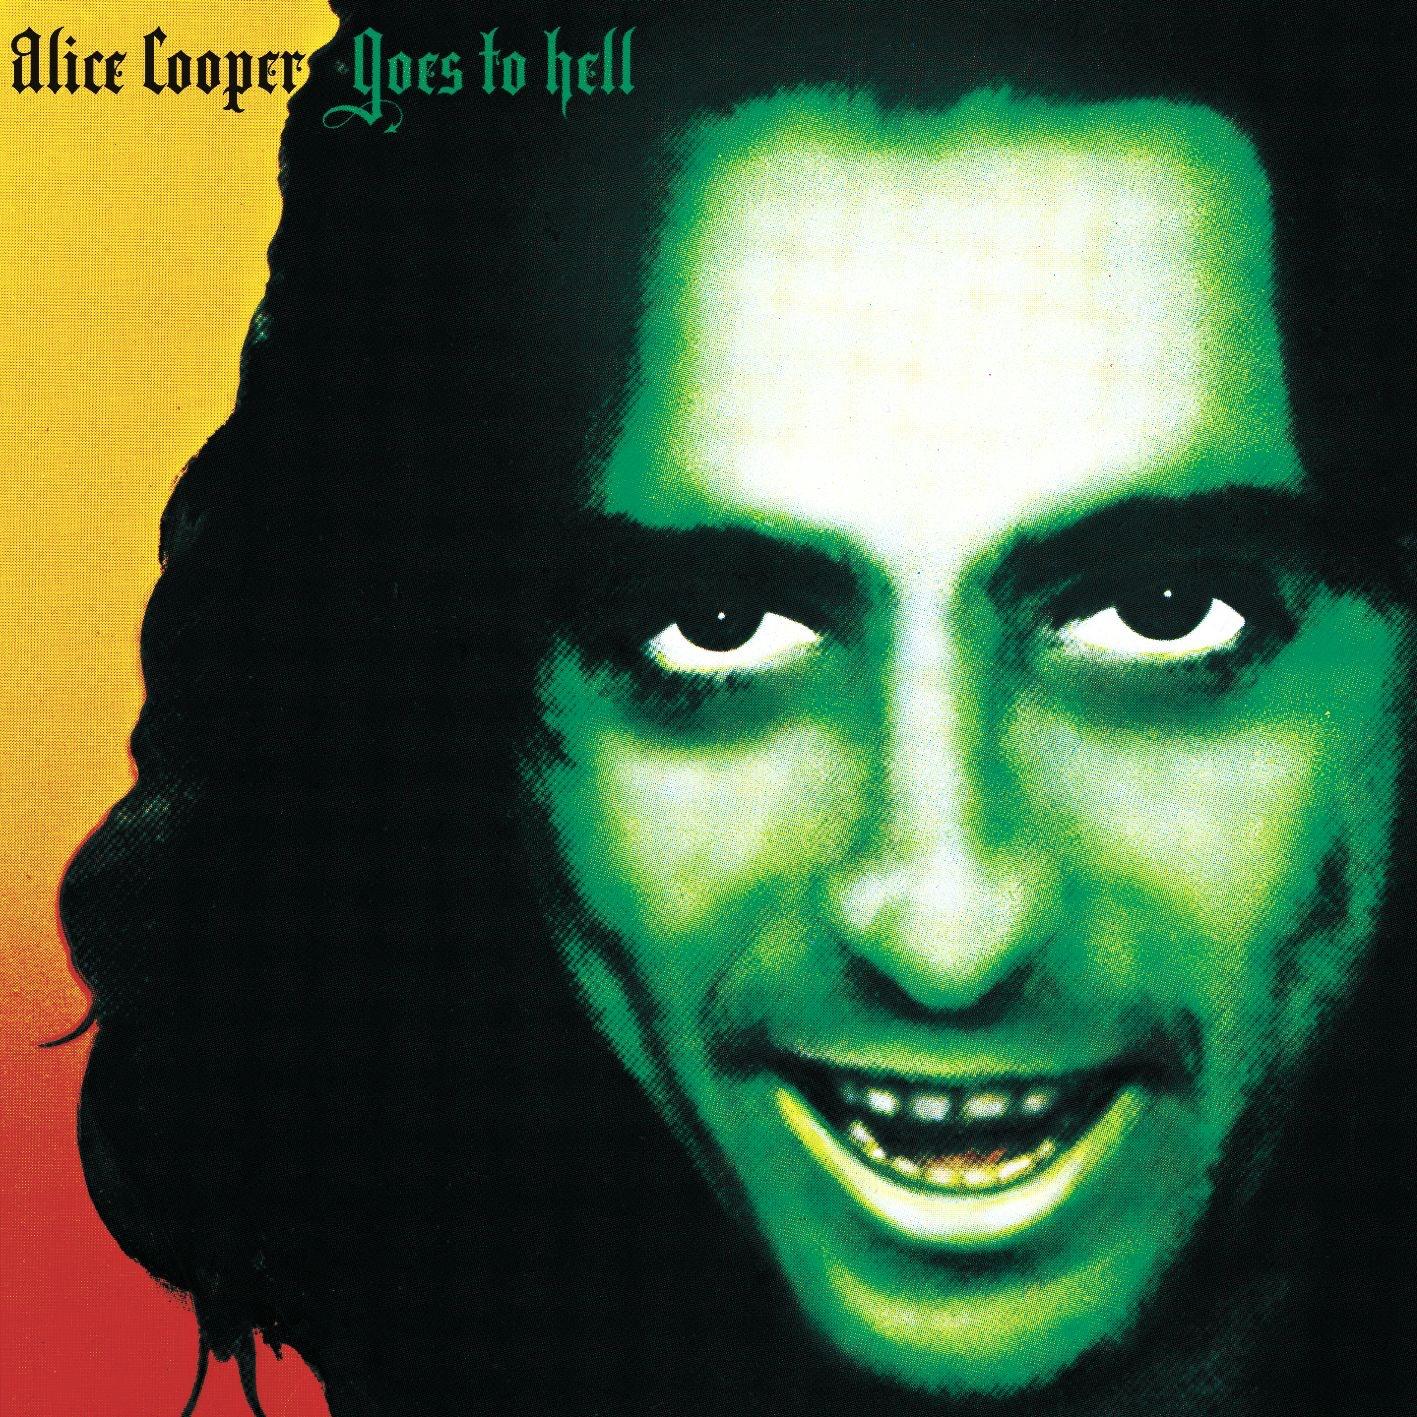 alice cooper a breaker of binary paradigm